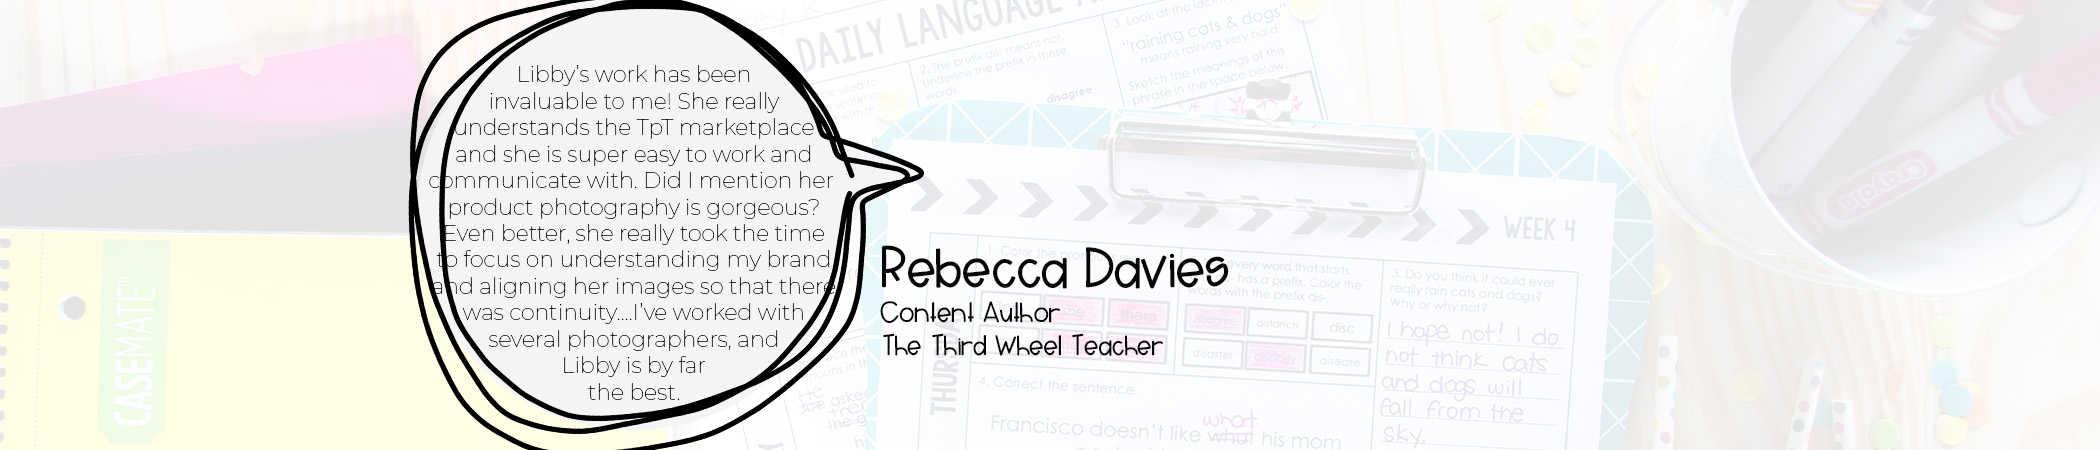 testimonial third wheel teacher Teachers Pay Teachers review photography design content products pinterest social media